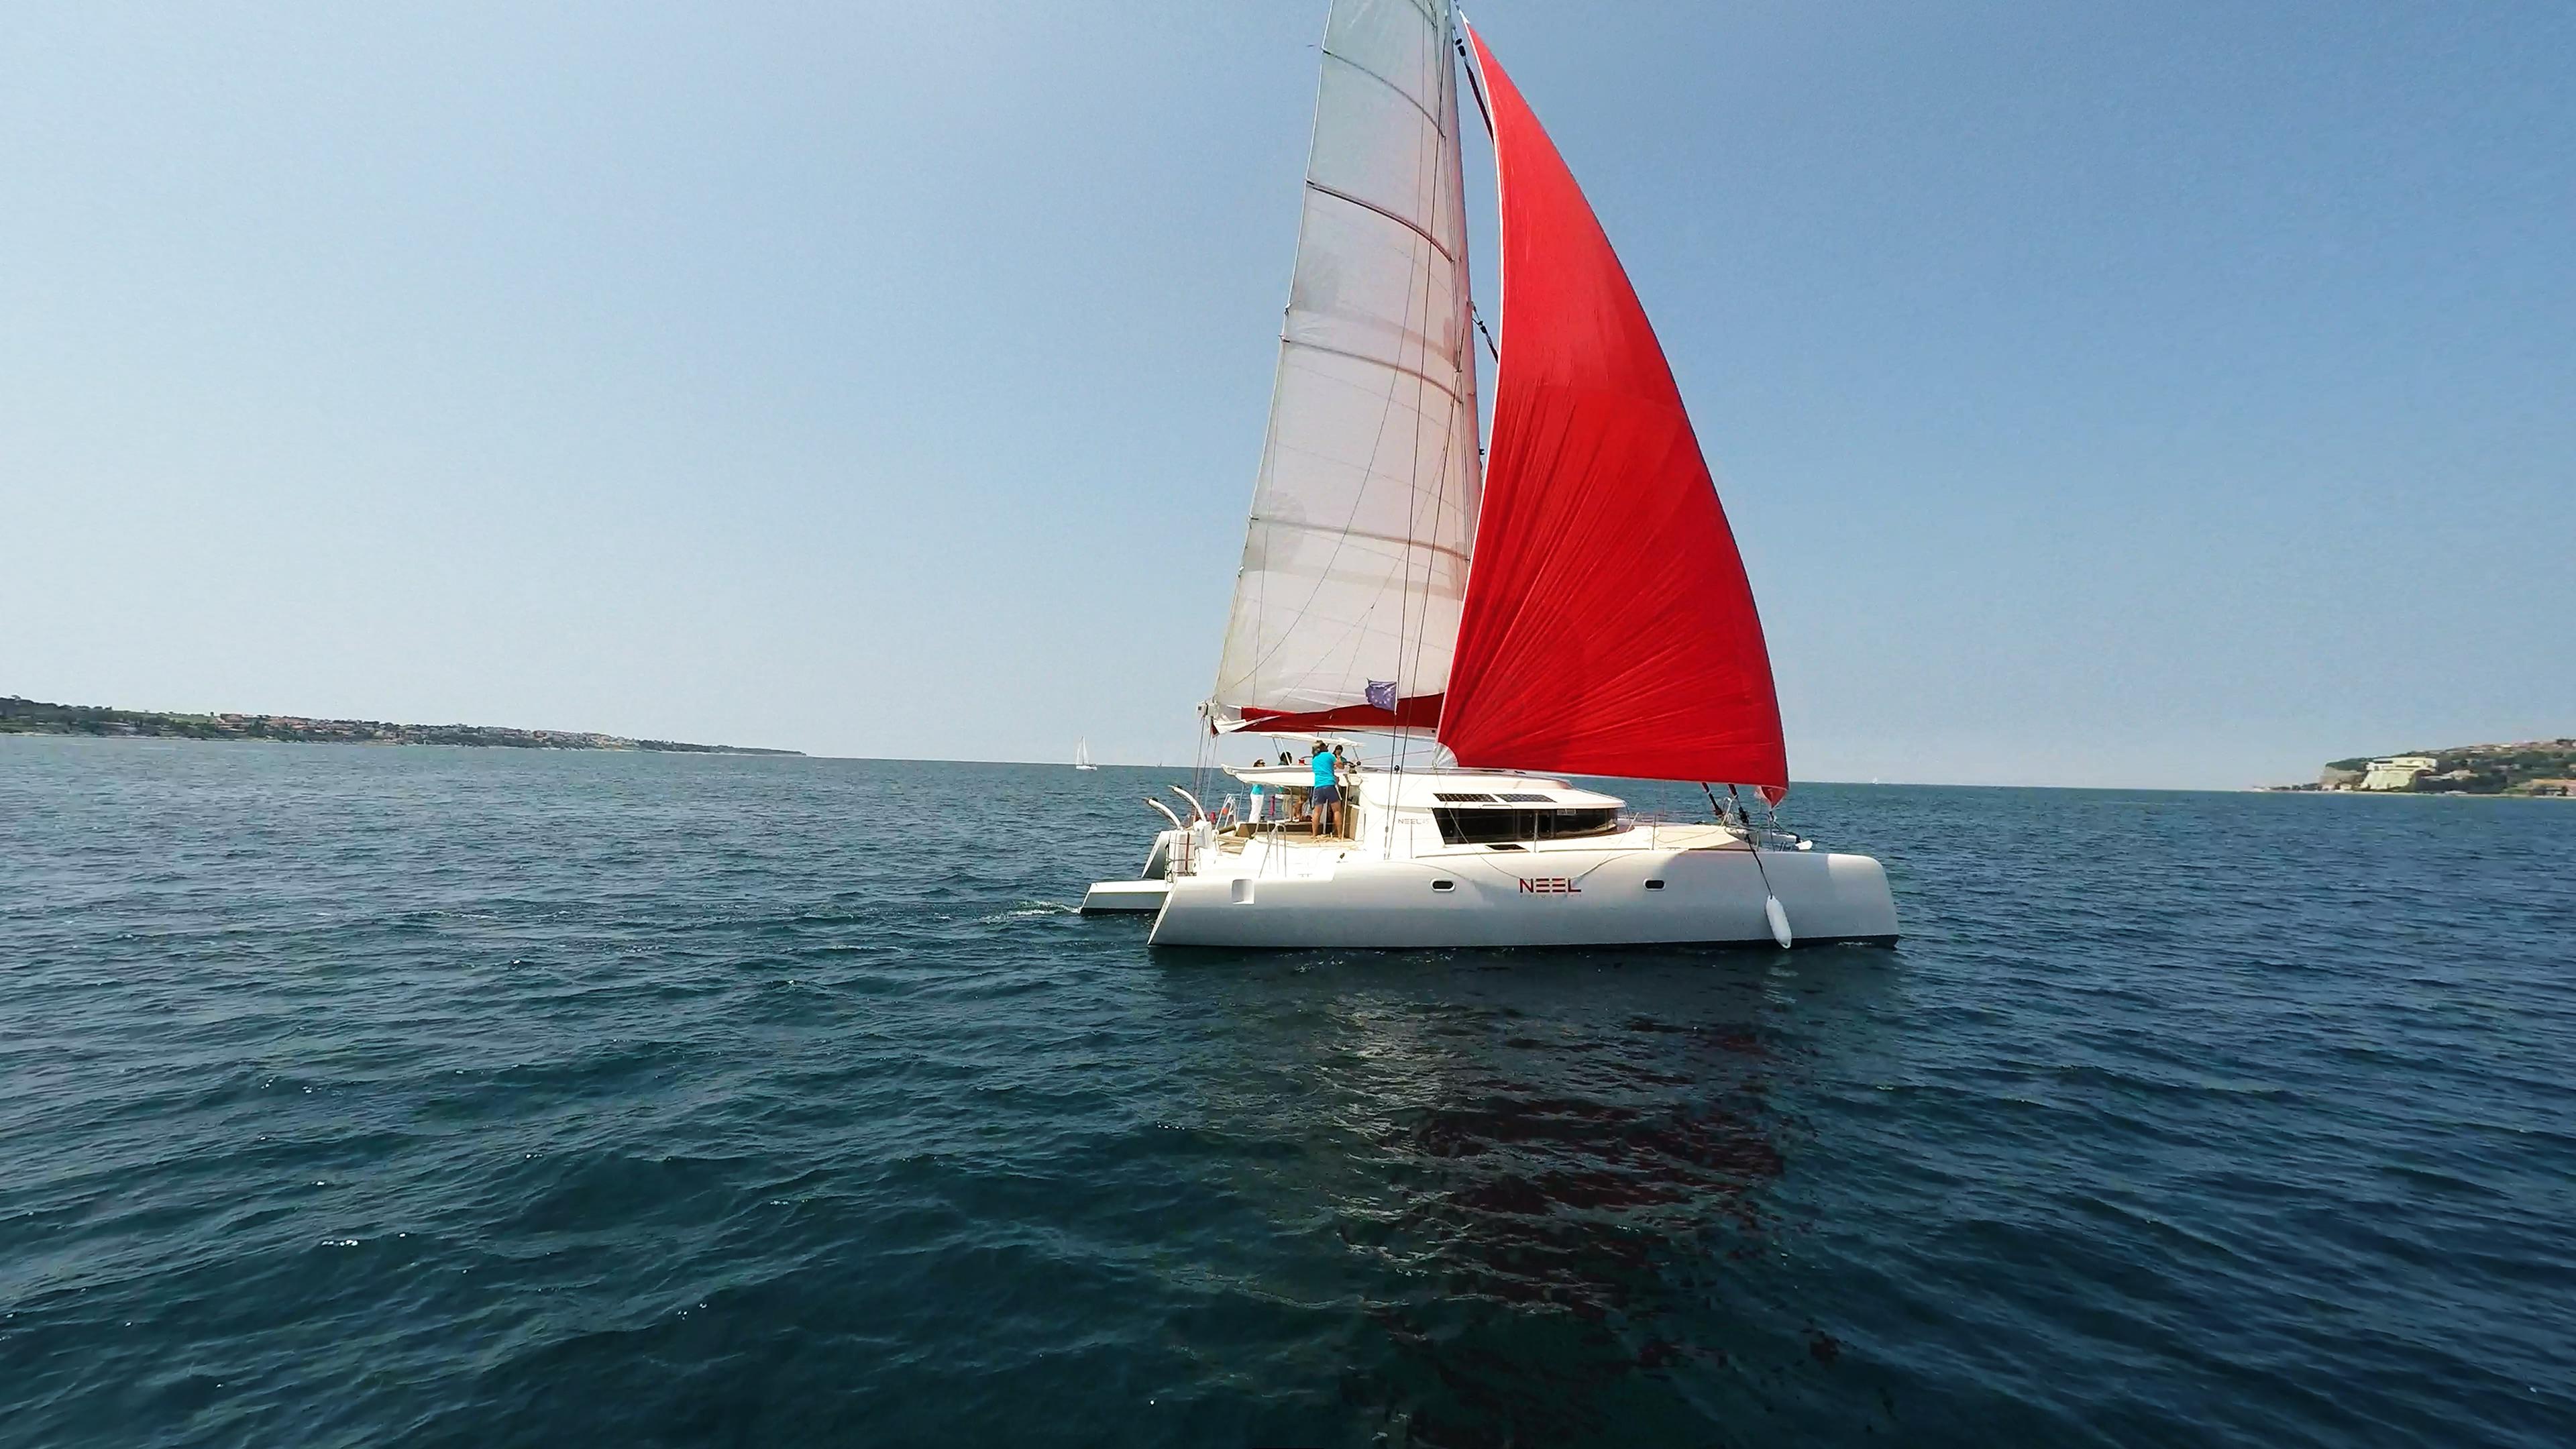 neel 45 yacht naviga a vela gennaker